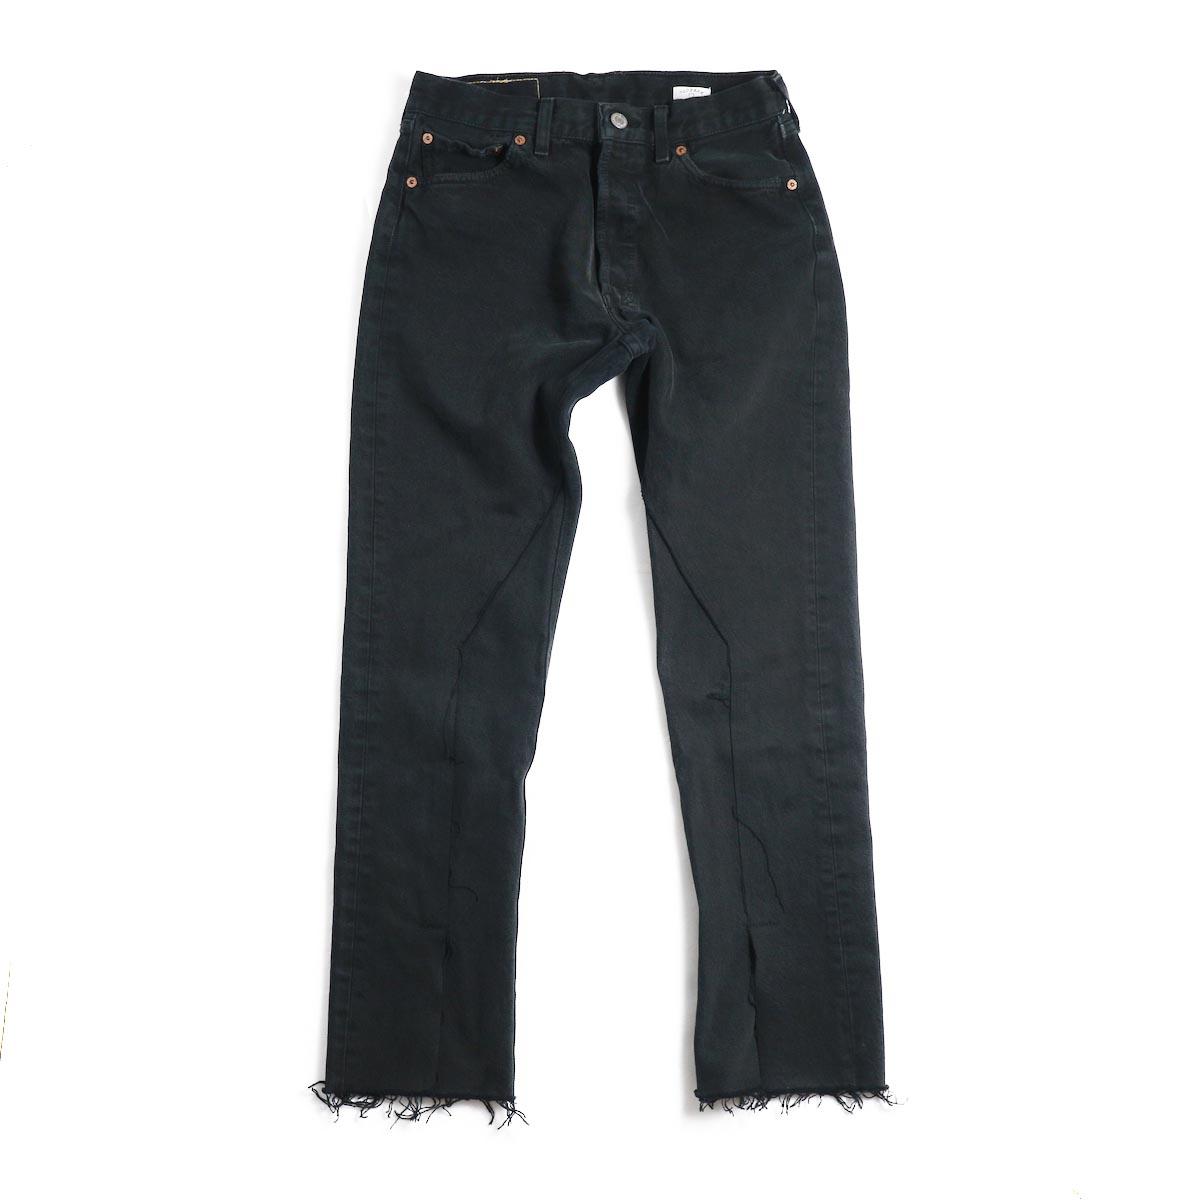 OLD PARK / Slit Jeans -Black Ssize(F)